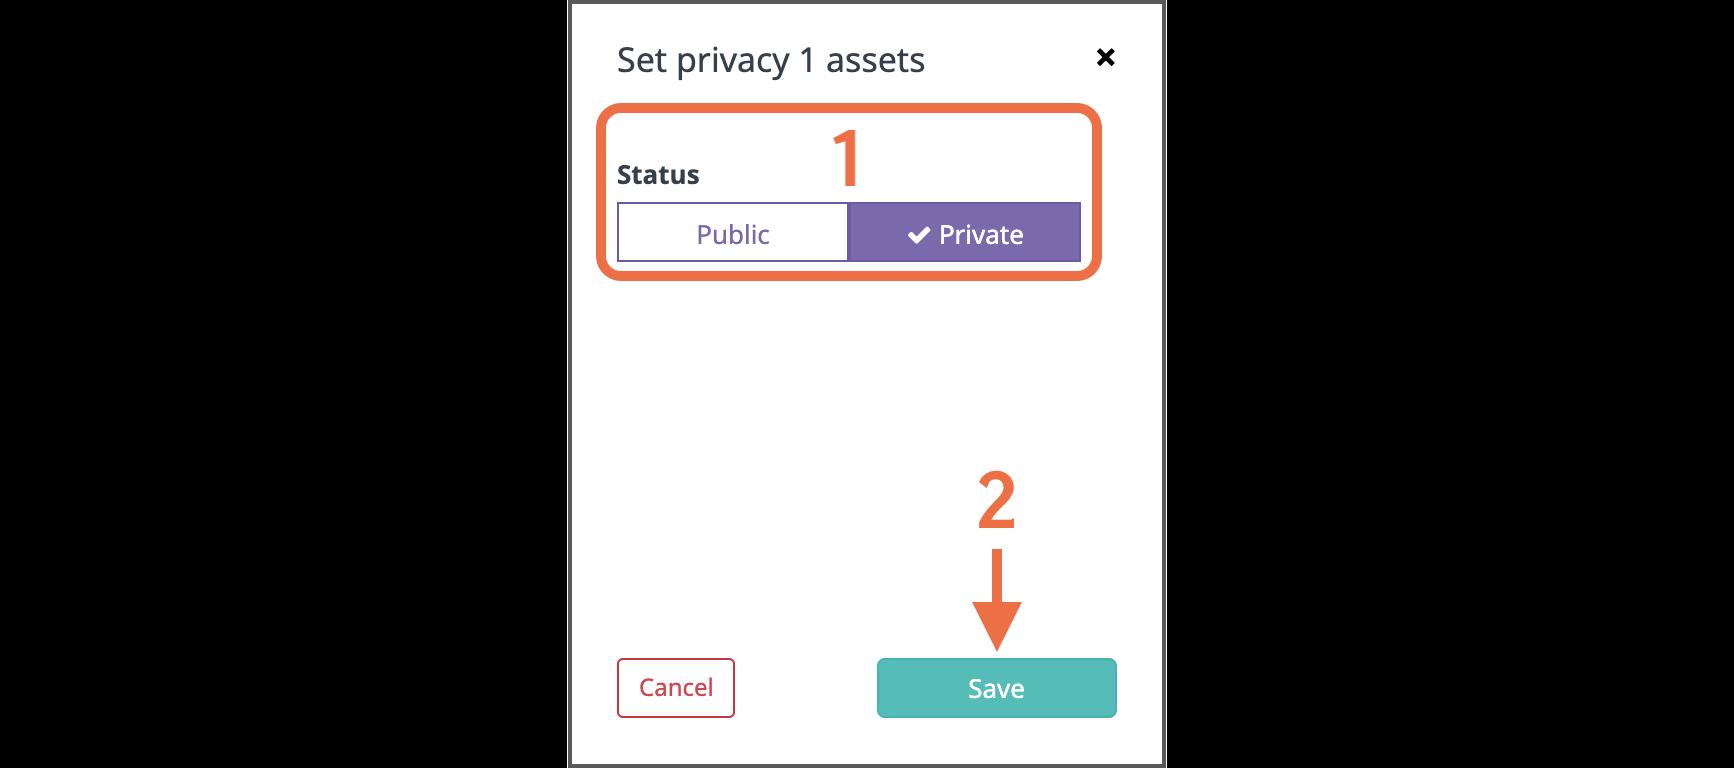 Choosing privacy-1